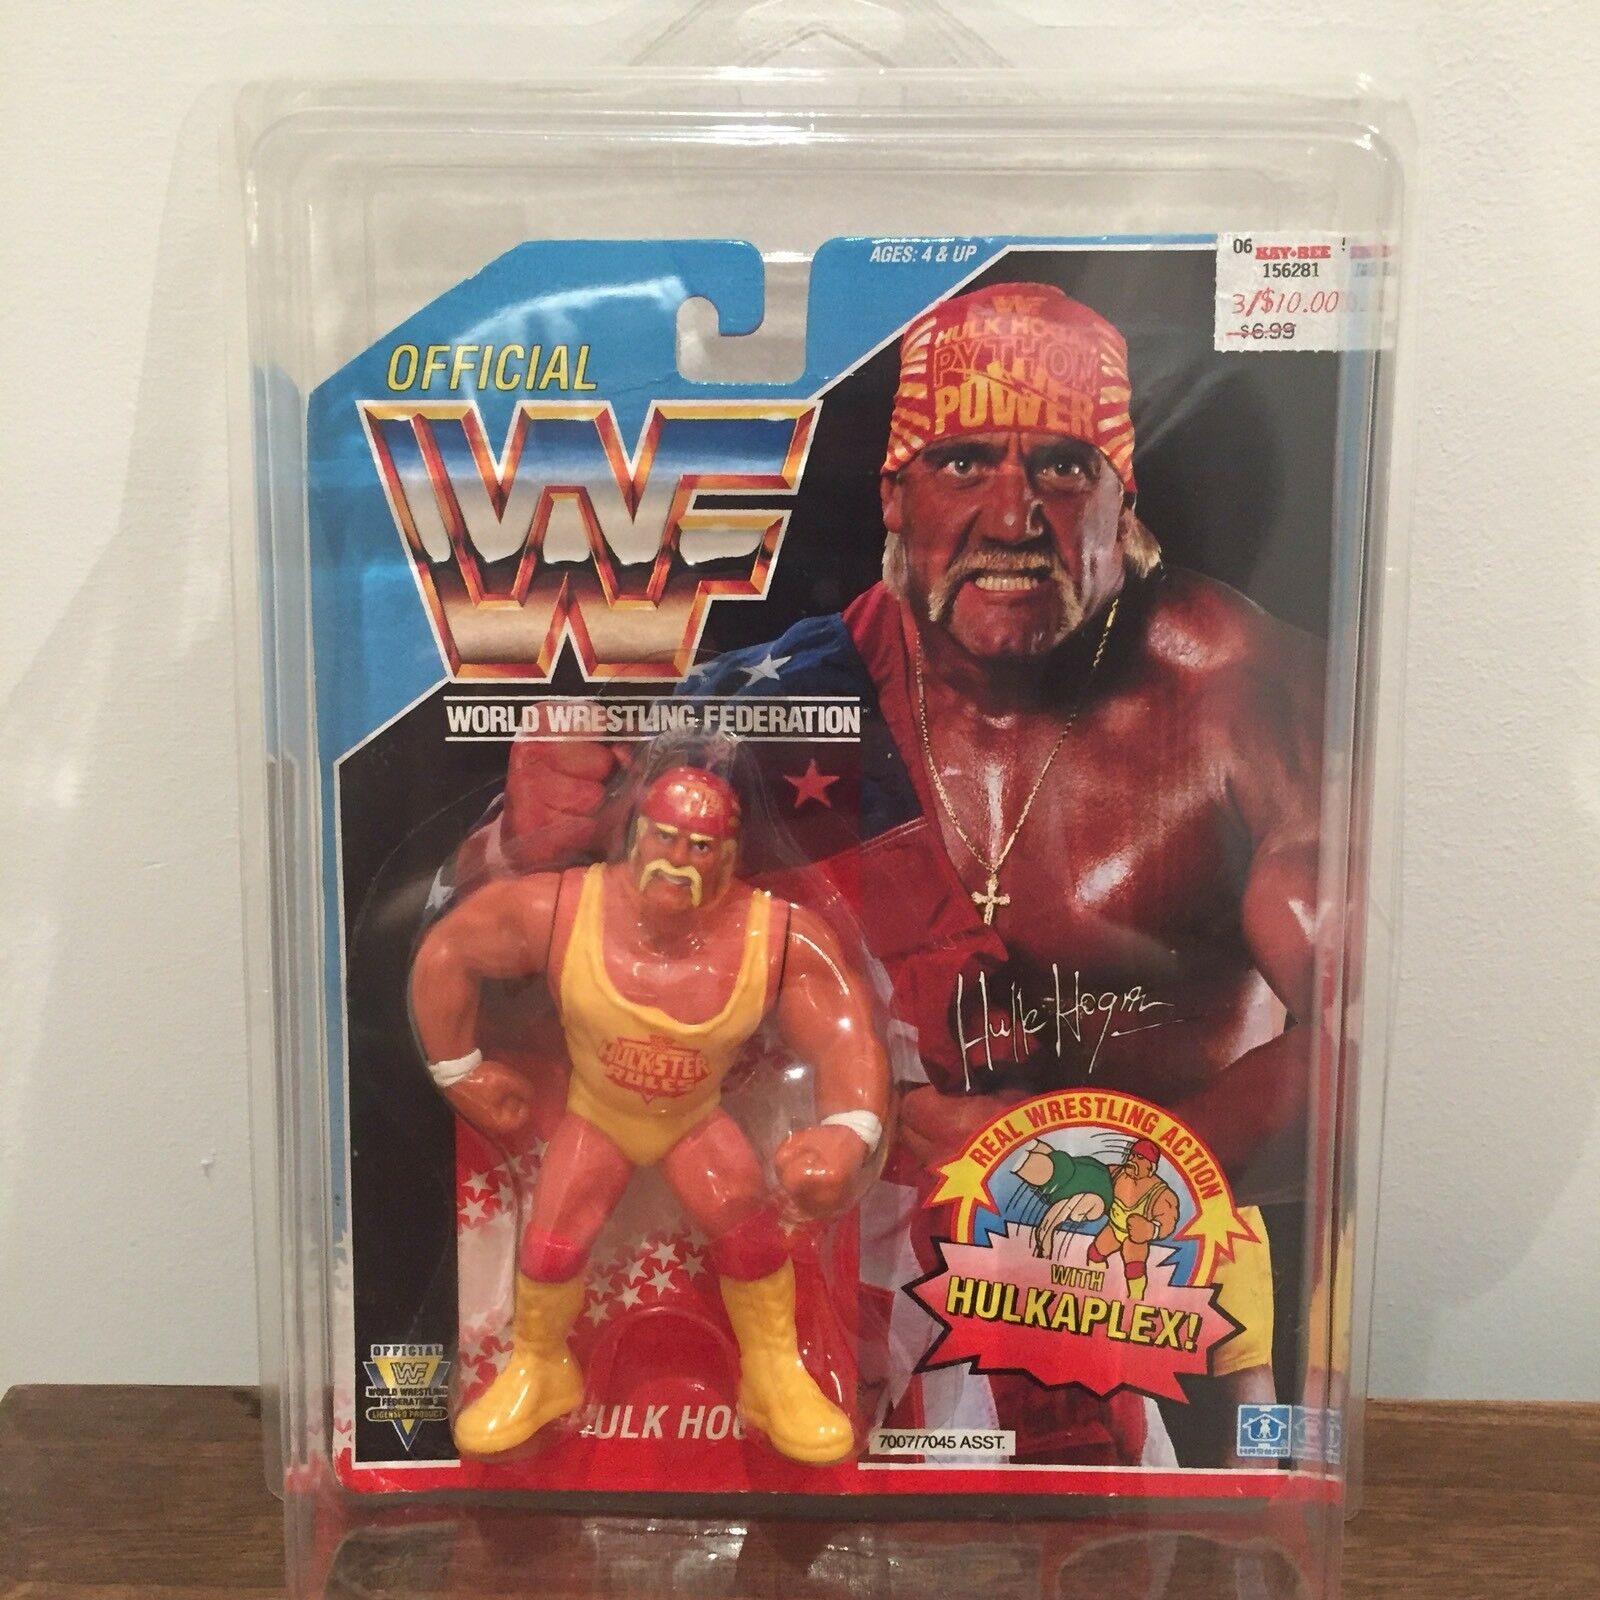 WWF WWE Hulk Hogan Vintage Hasbro Action Figure 1992 Series 3 MOC with case